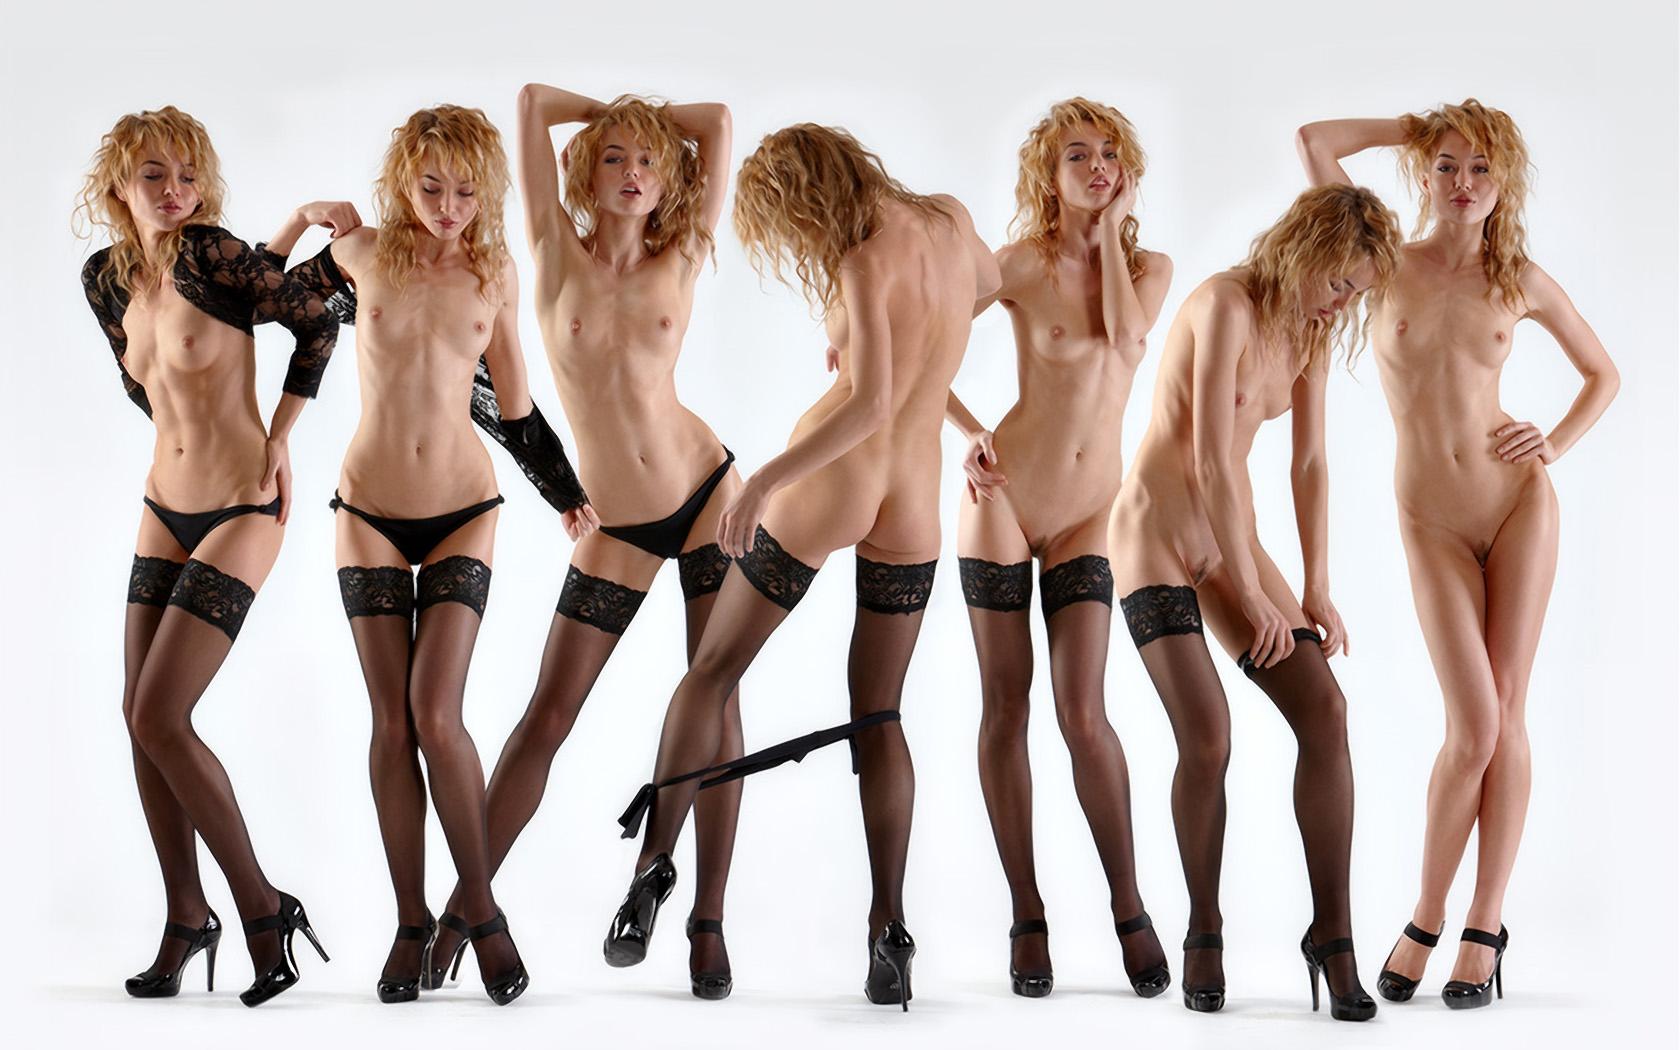 Just girls nude dance